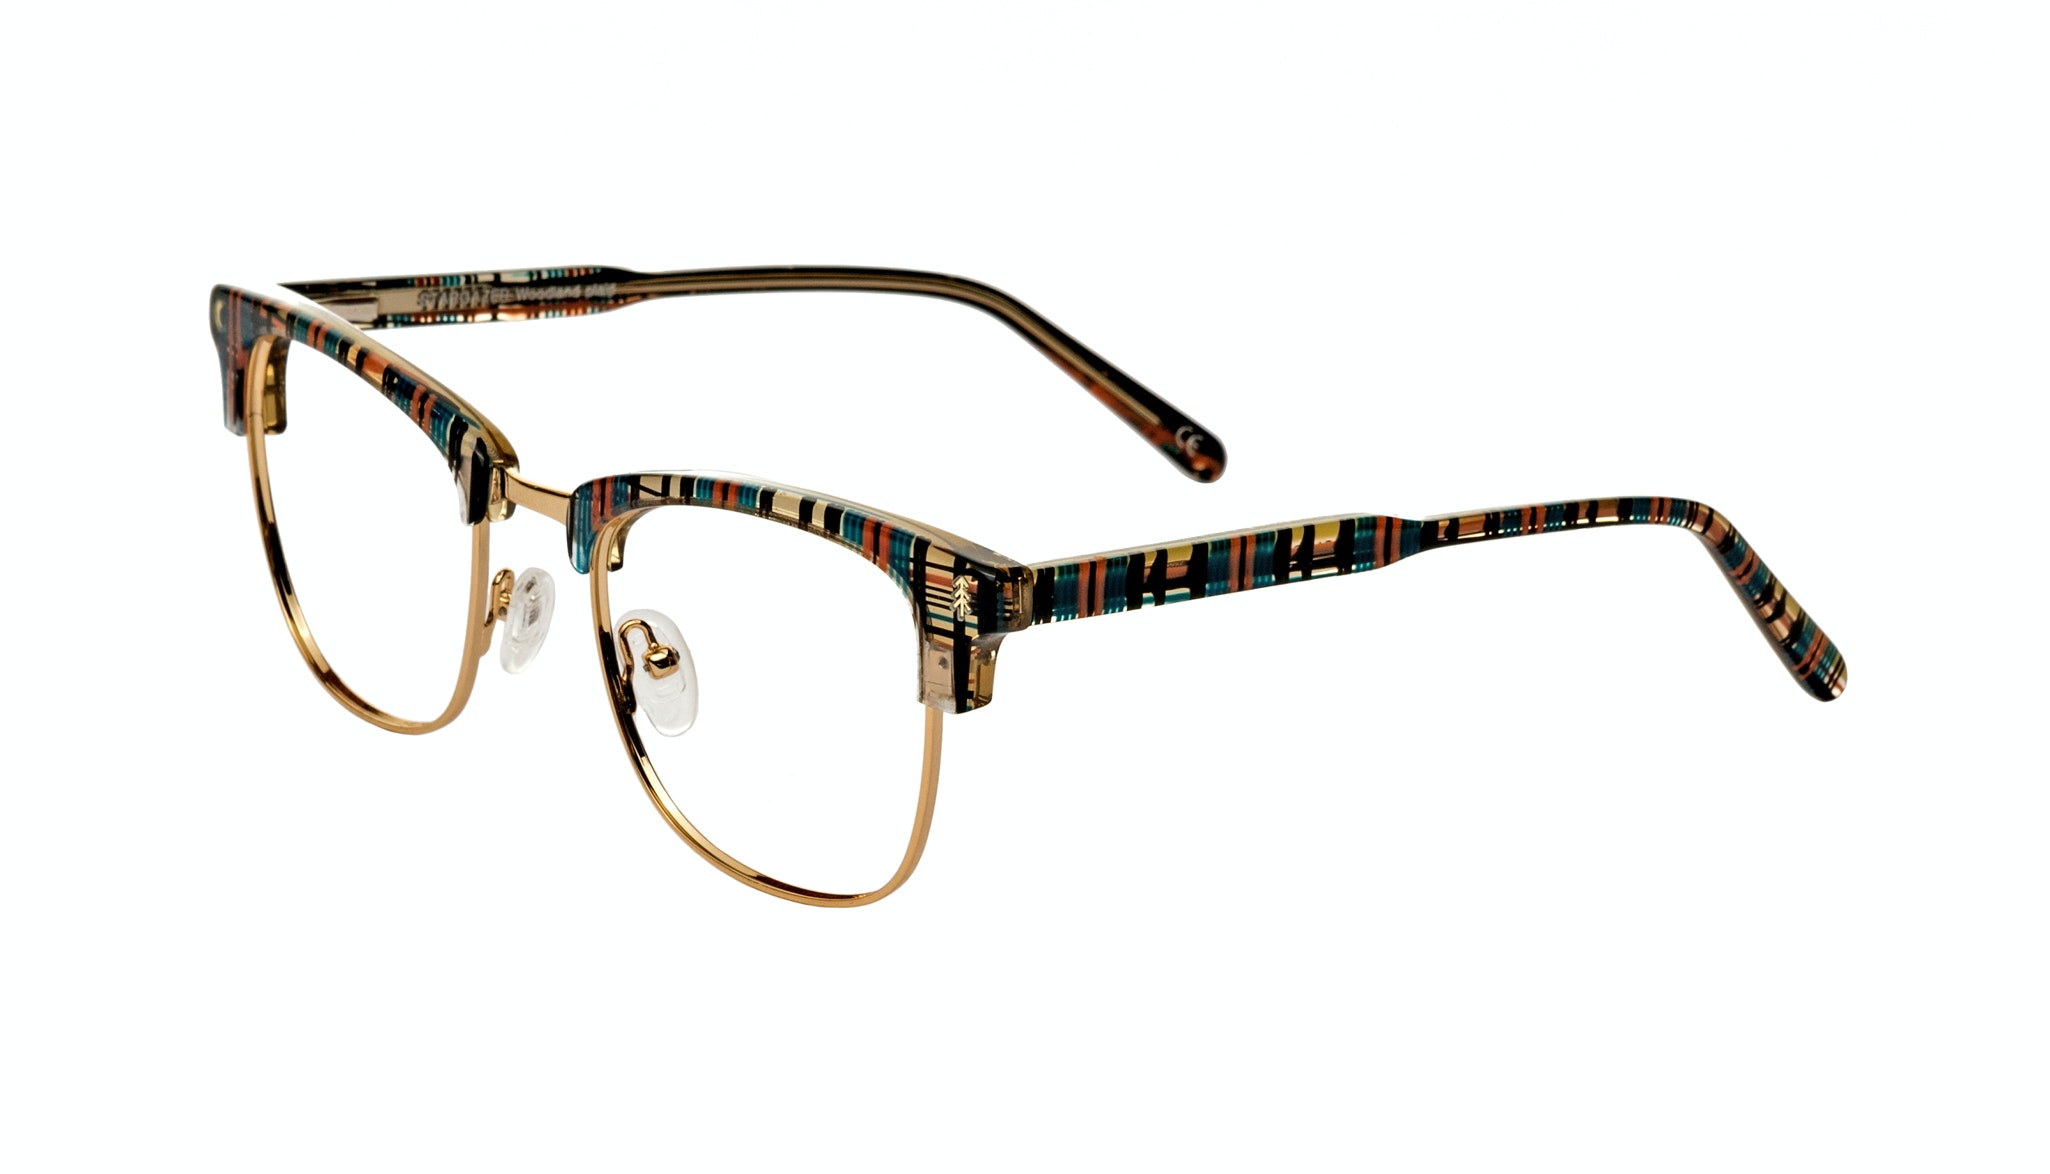 Affordable Fashion Glasses Rectangle Eyeglasses Women Stargazer Woodland Plaid Tilt